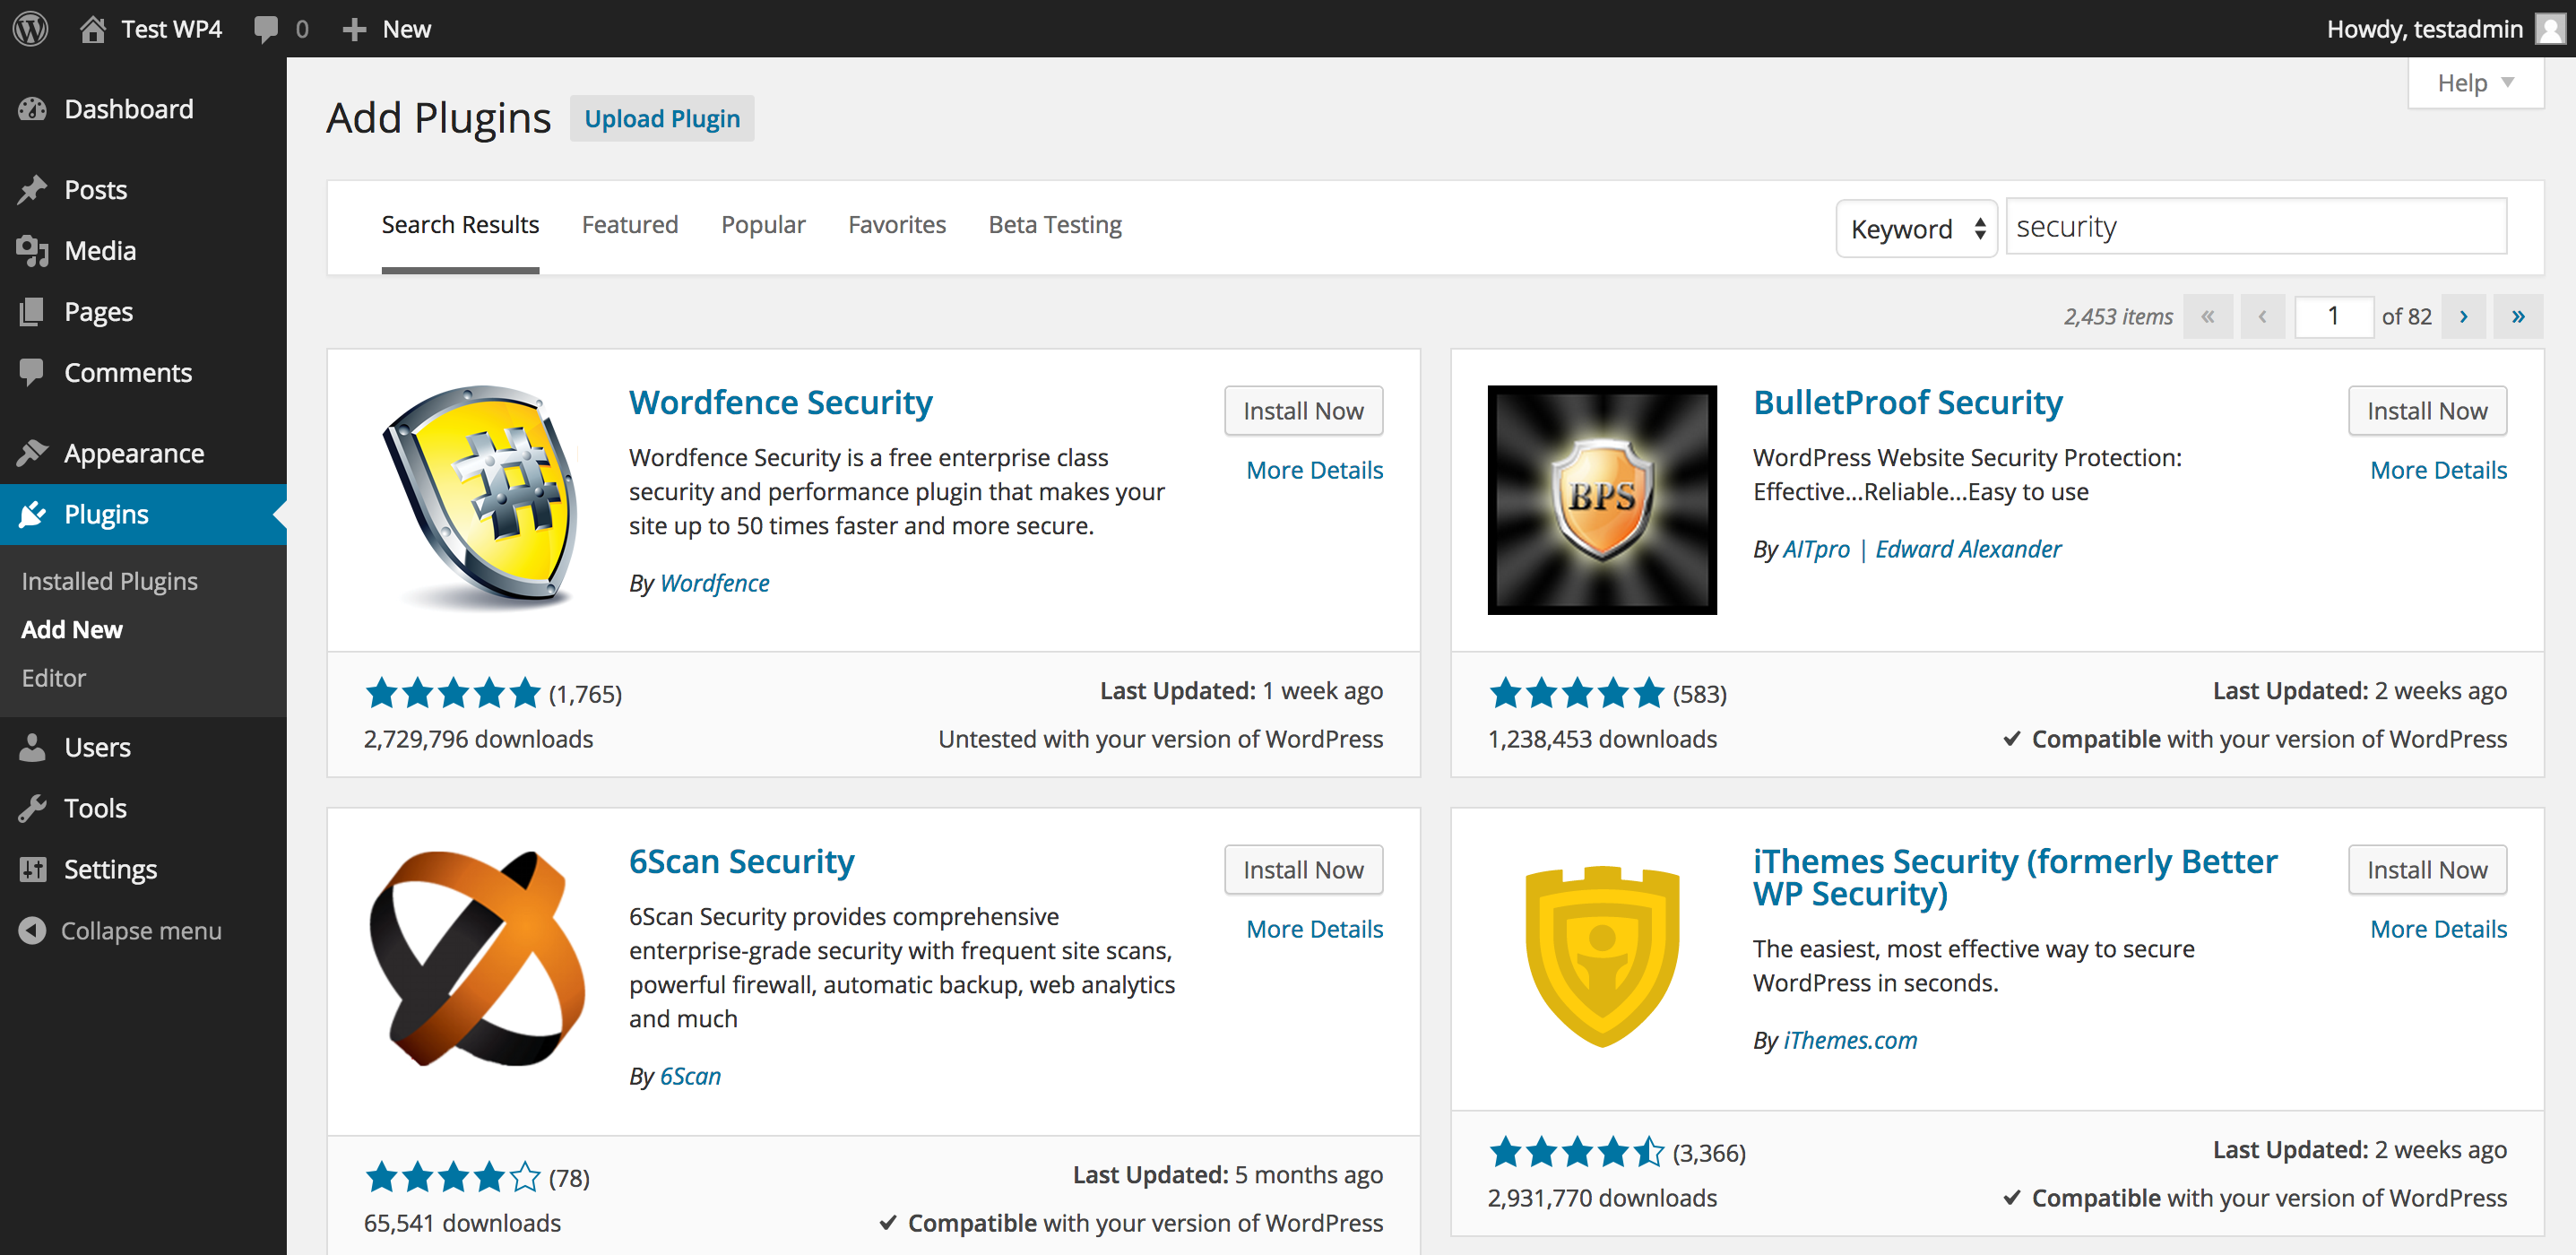 WordPress 4.0 Plugin Install View